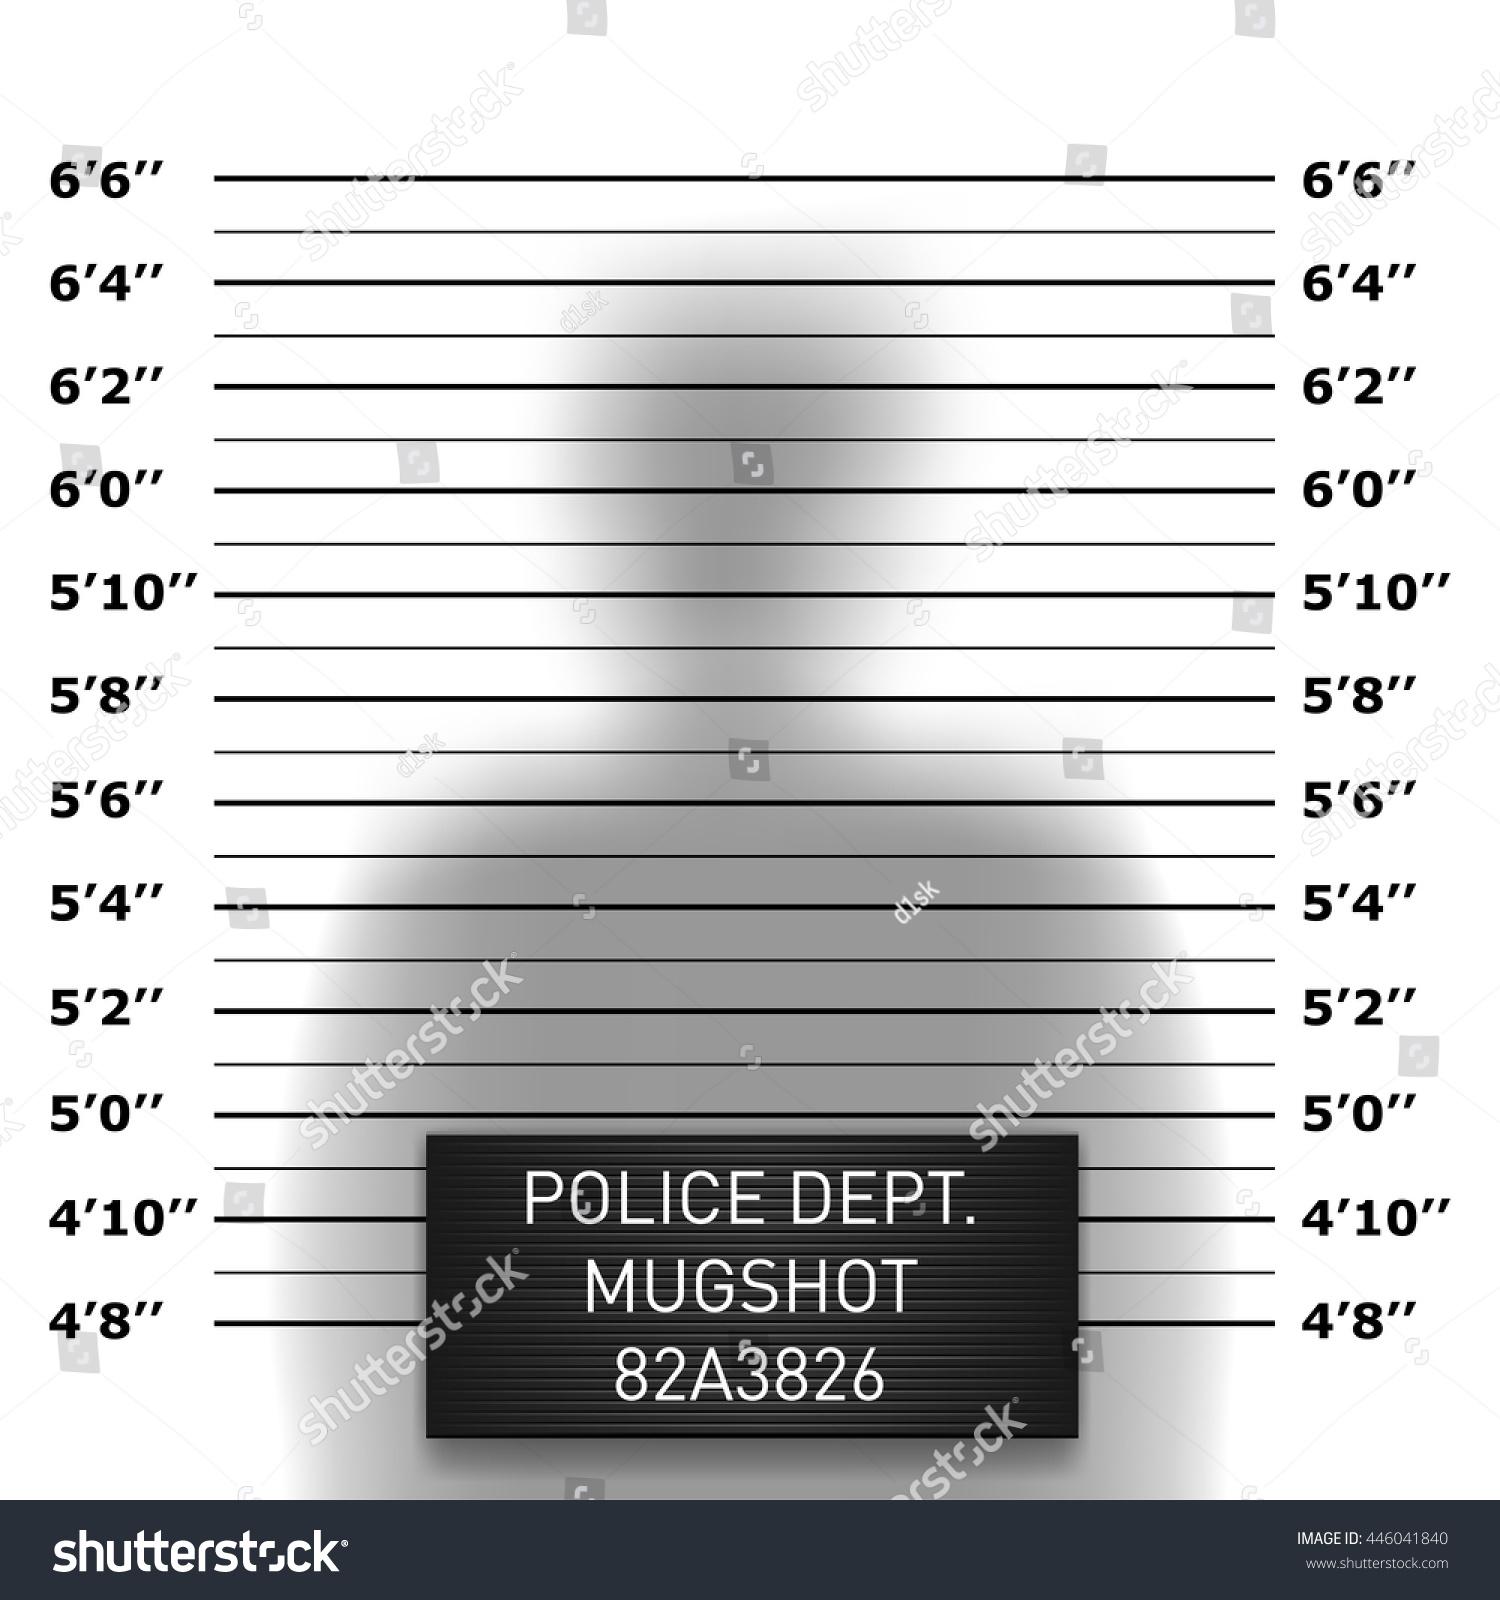 police mugshot template stock vector 446041840 shutterstock